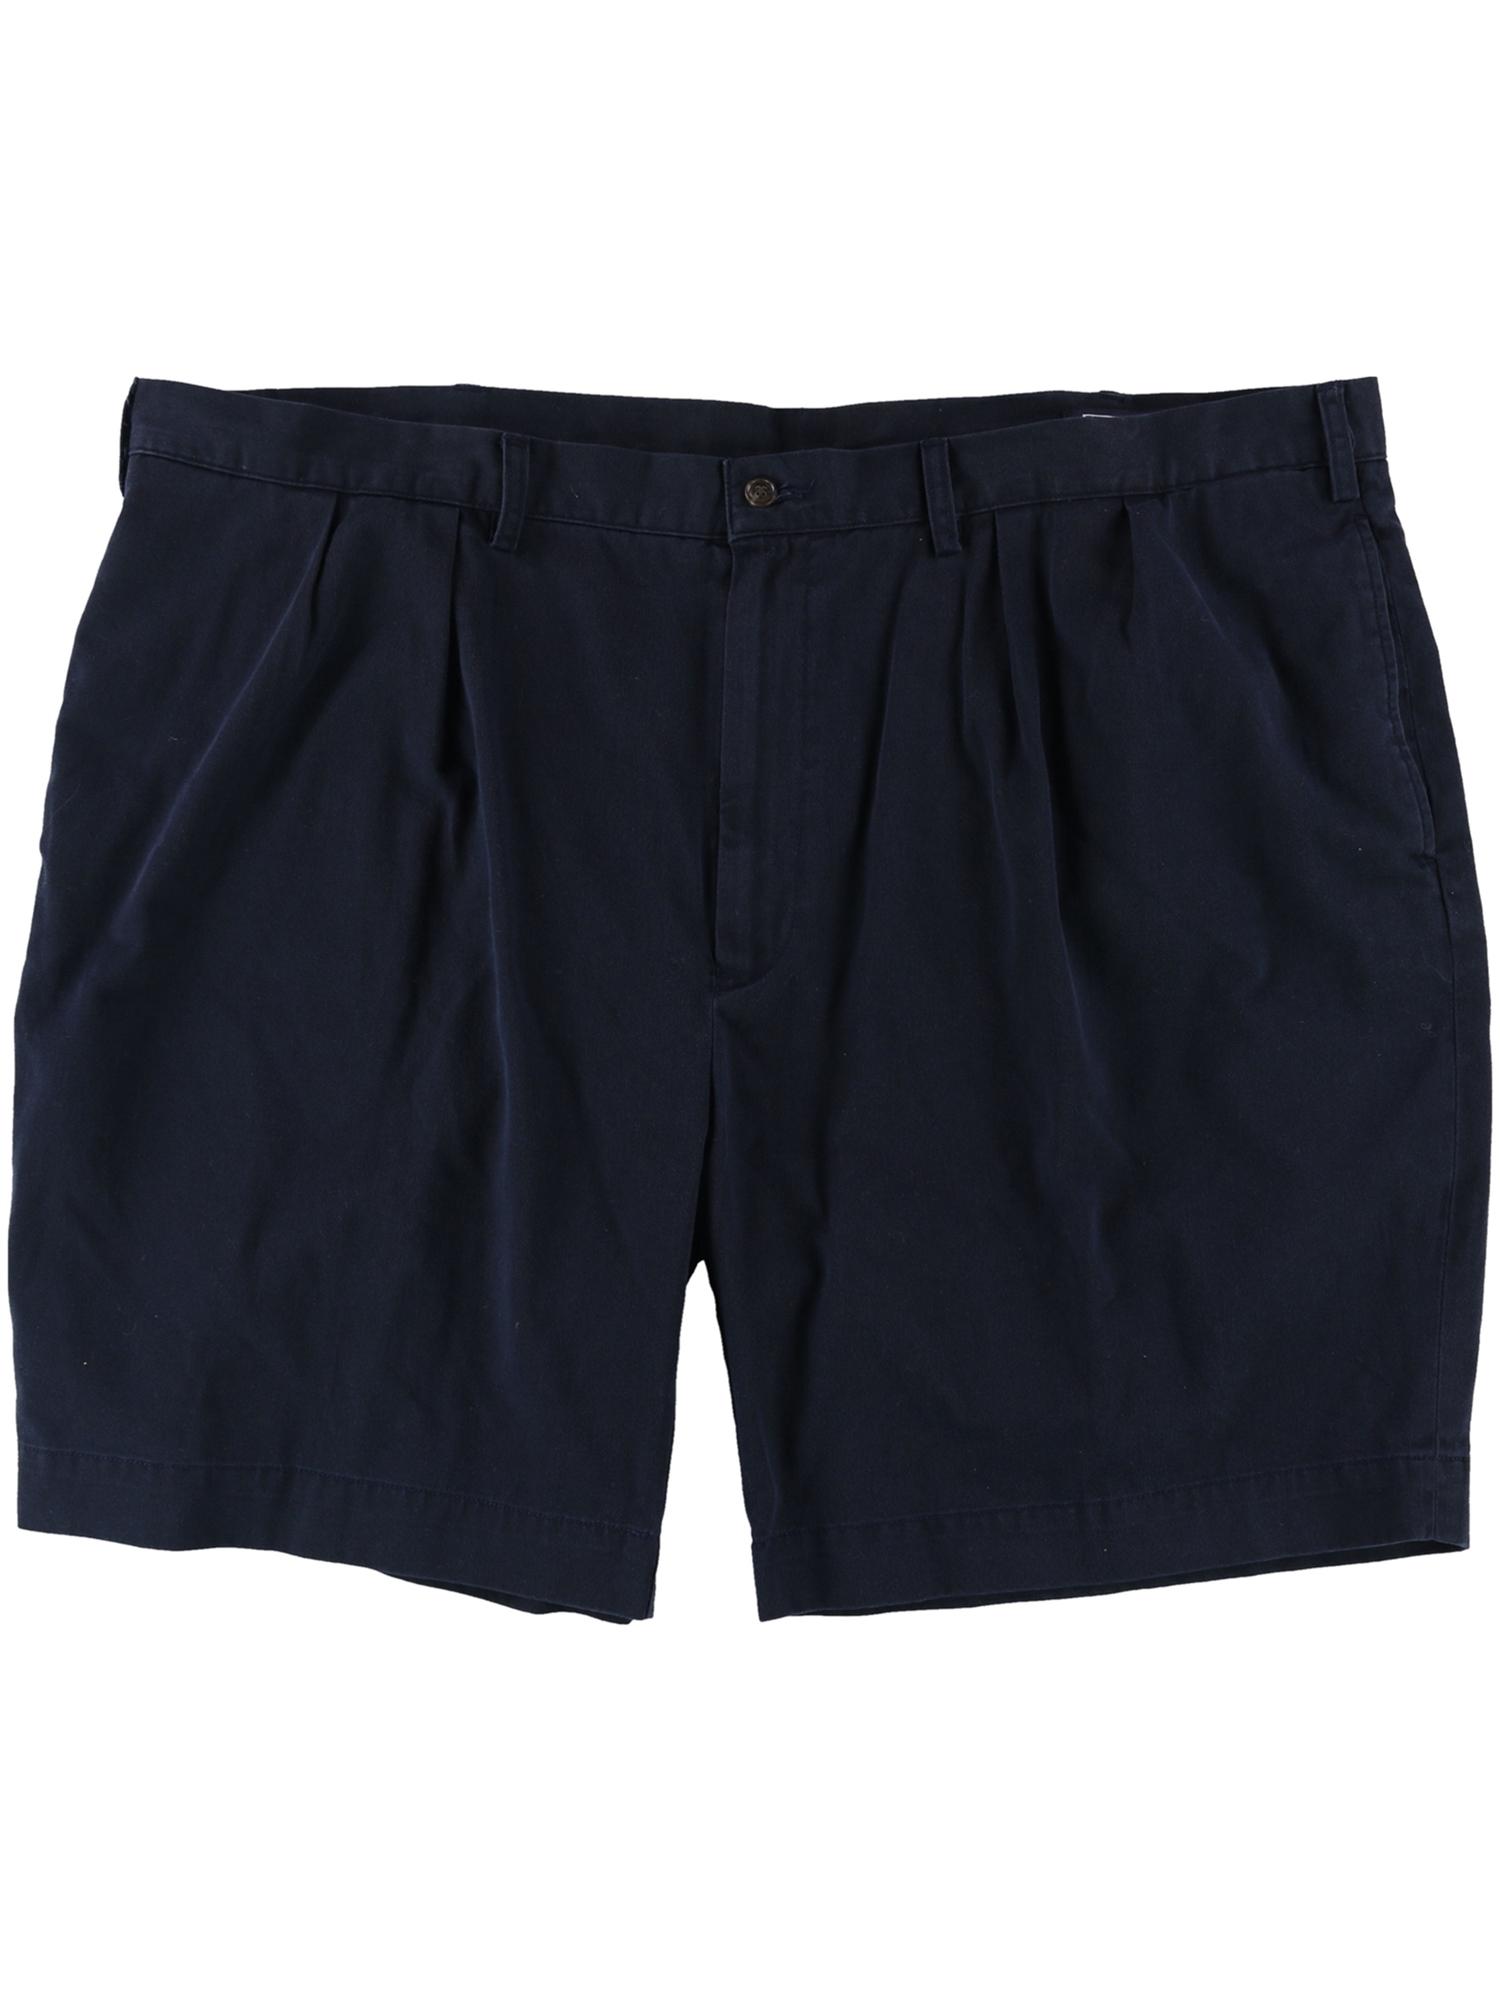 Ralph Lauren Mens Ethan Pleated Casual Chino Shorts adiw 46 Big - Big & Tall